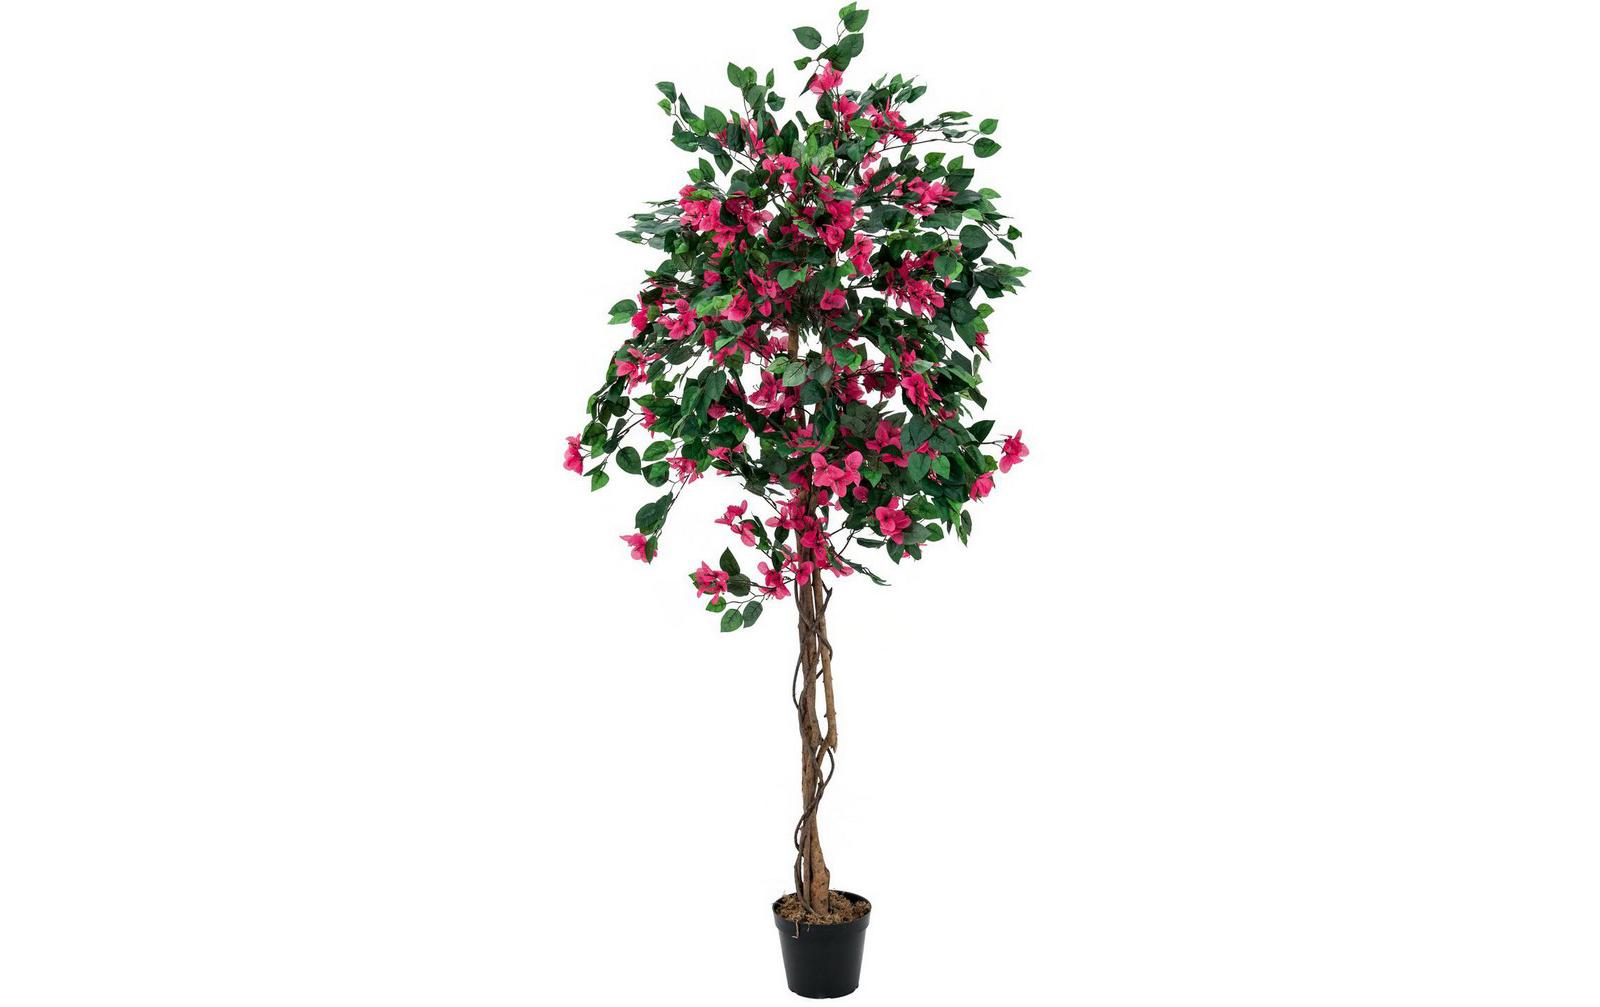 europalms-bougainvillea-rot-150cm-kunststoffpflanze